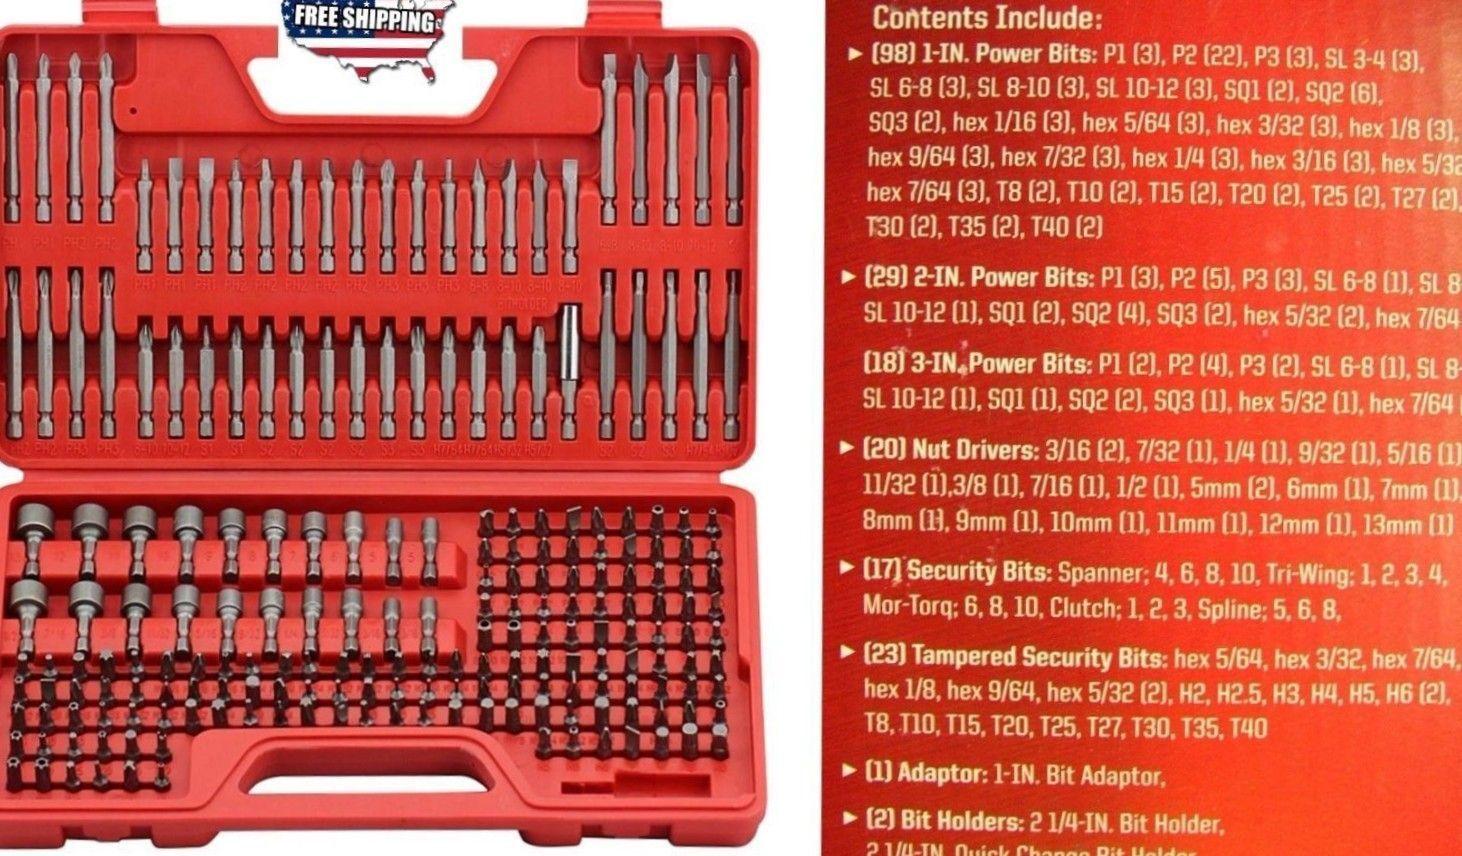 Multibit Screwdriver Set 208 Pcs Torx Phillips Hex Slotted Home Hand Tools Case